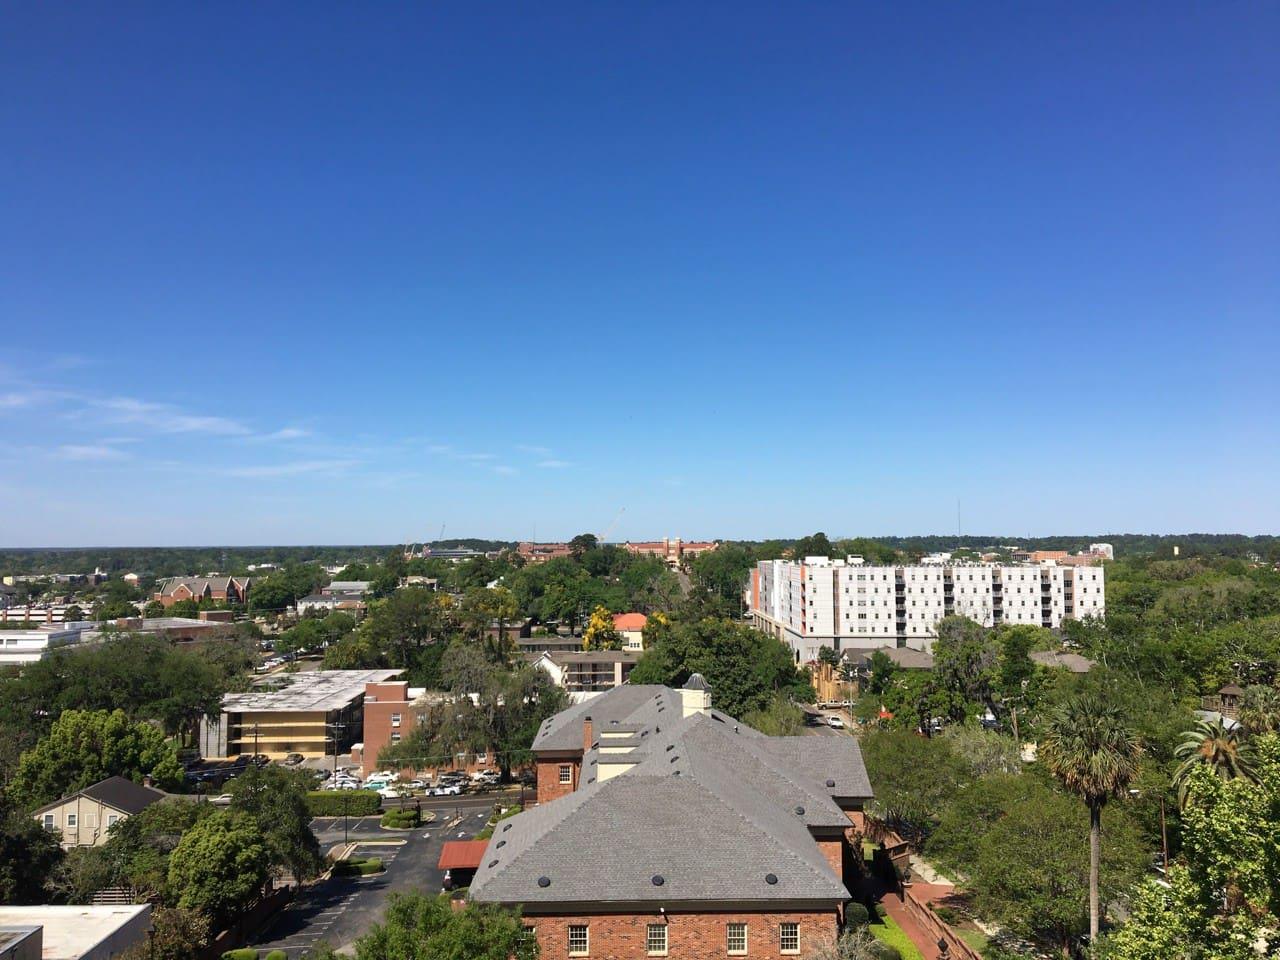 Best view of Wescott and FSU Campus